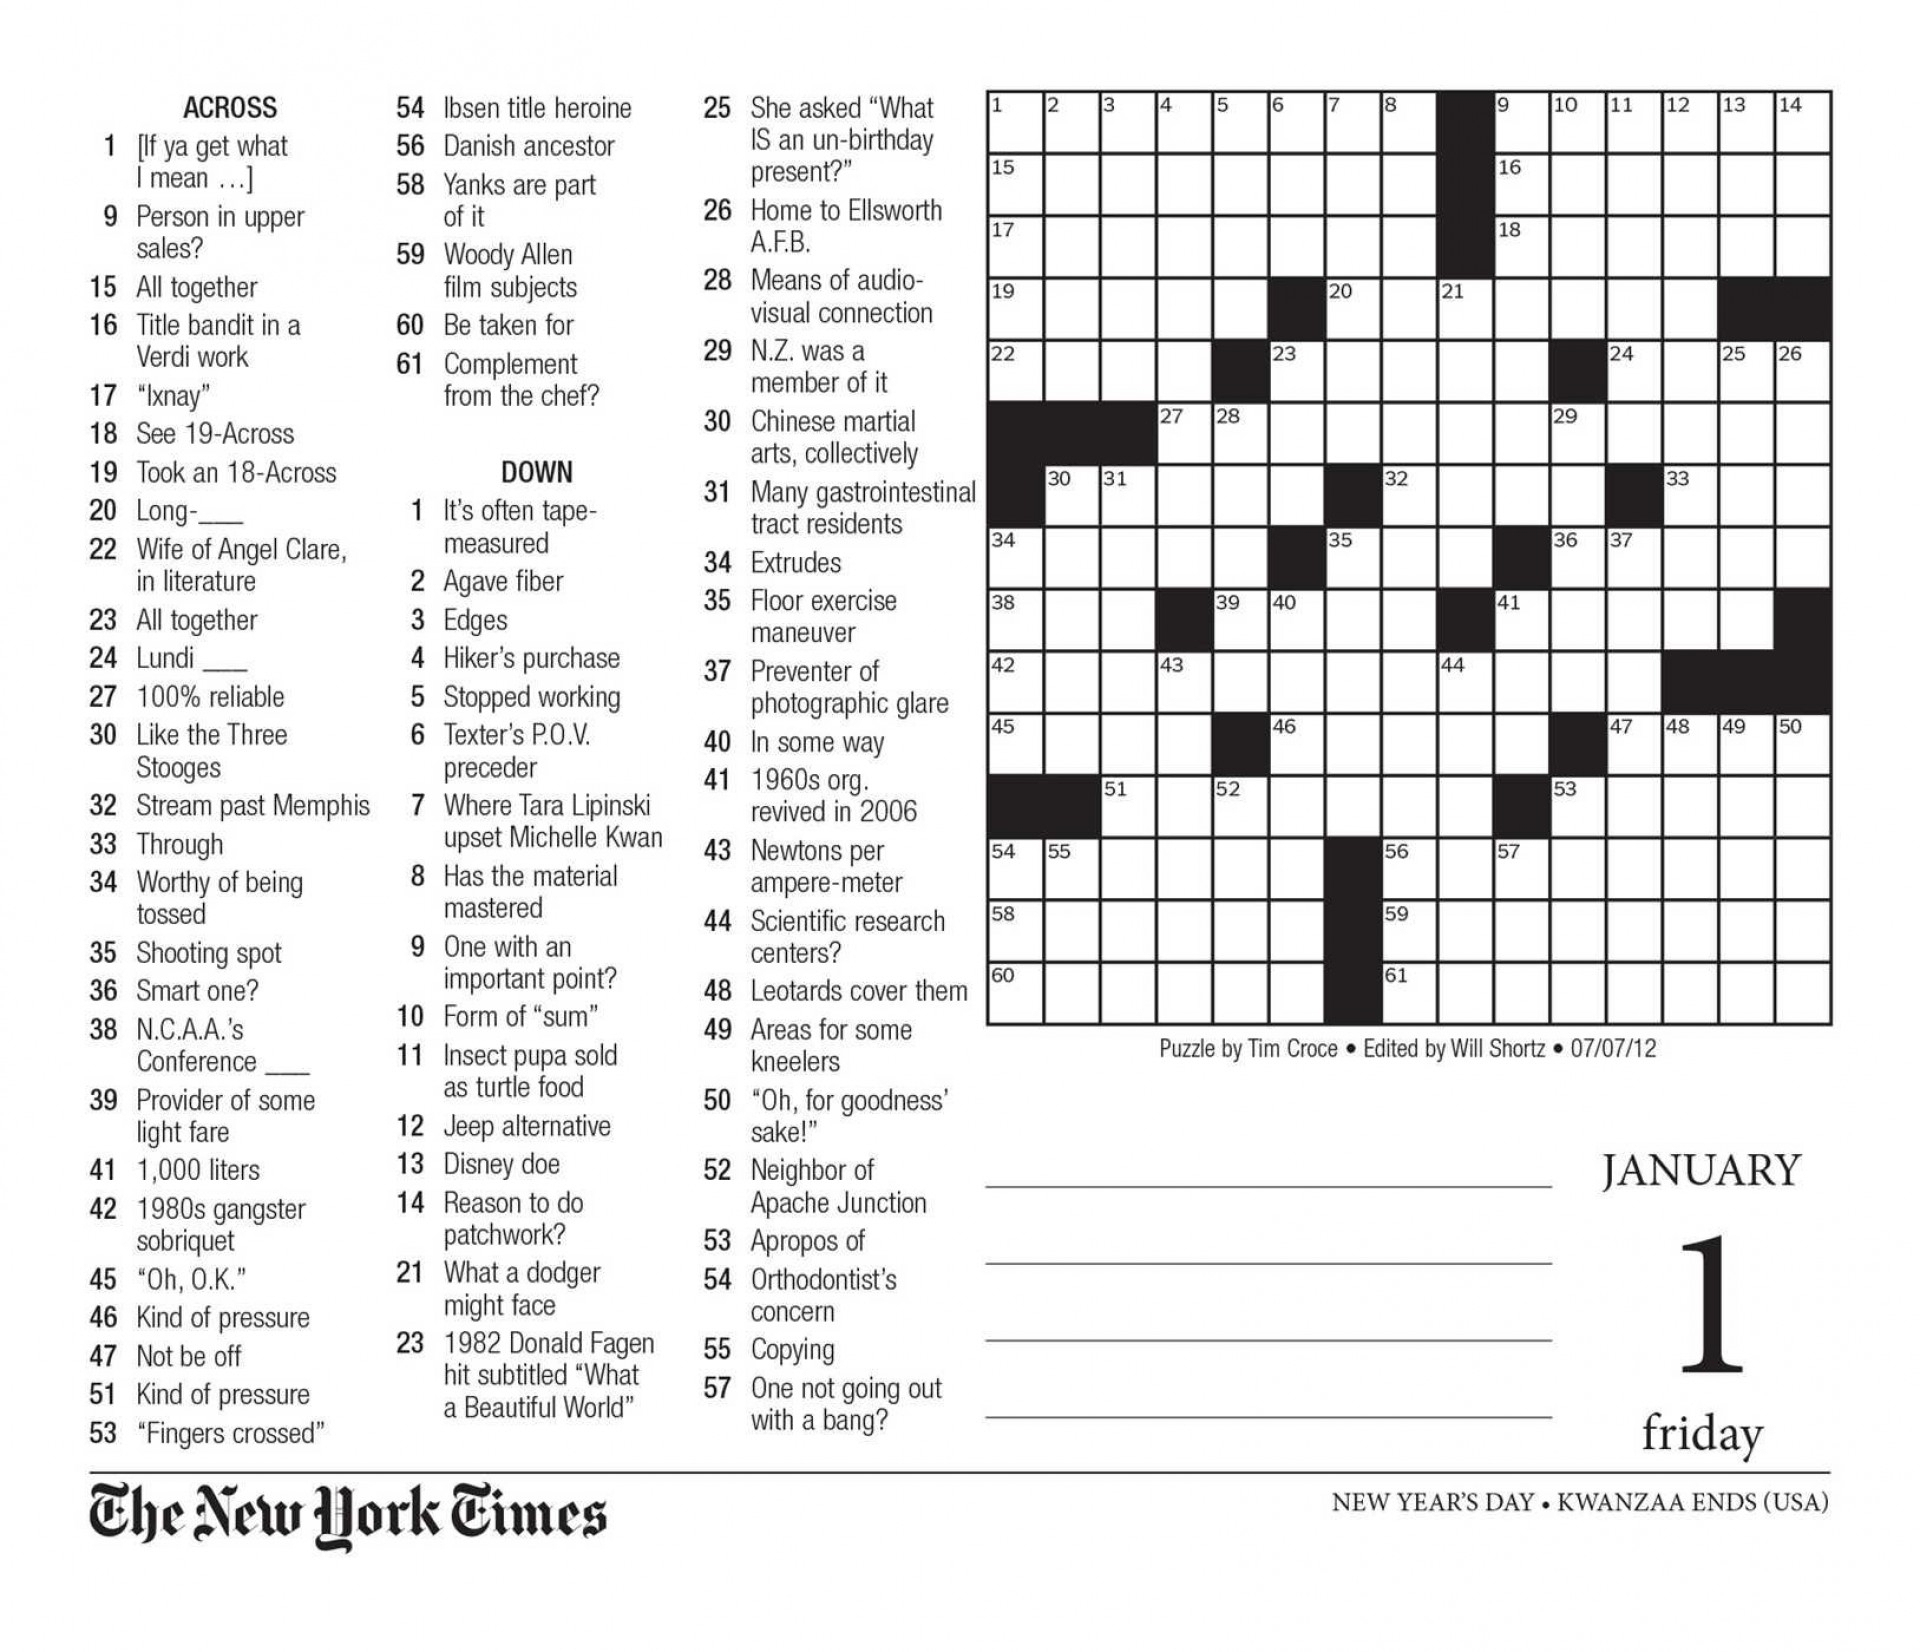 Free Printable Large Print Crossword Puzzles | M3U8 - Free Printable - Printable Crossword Puzzles 2012